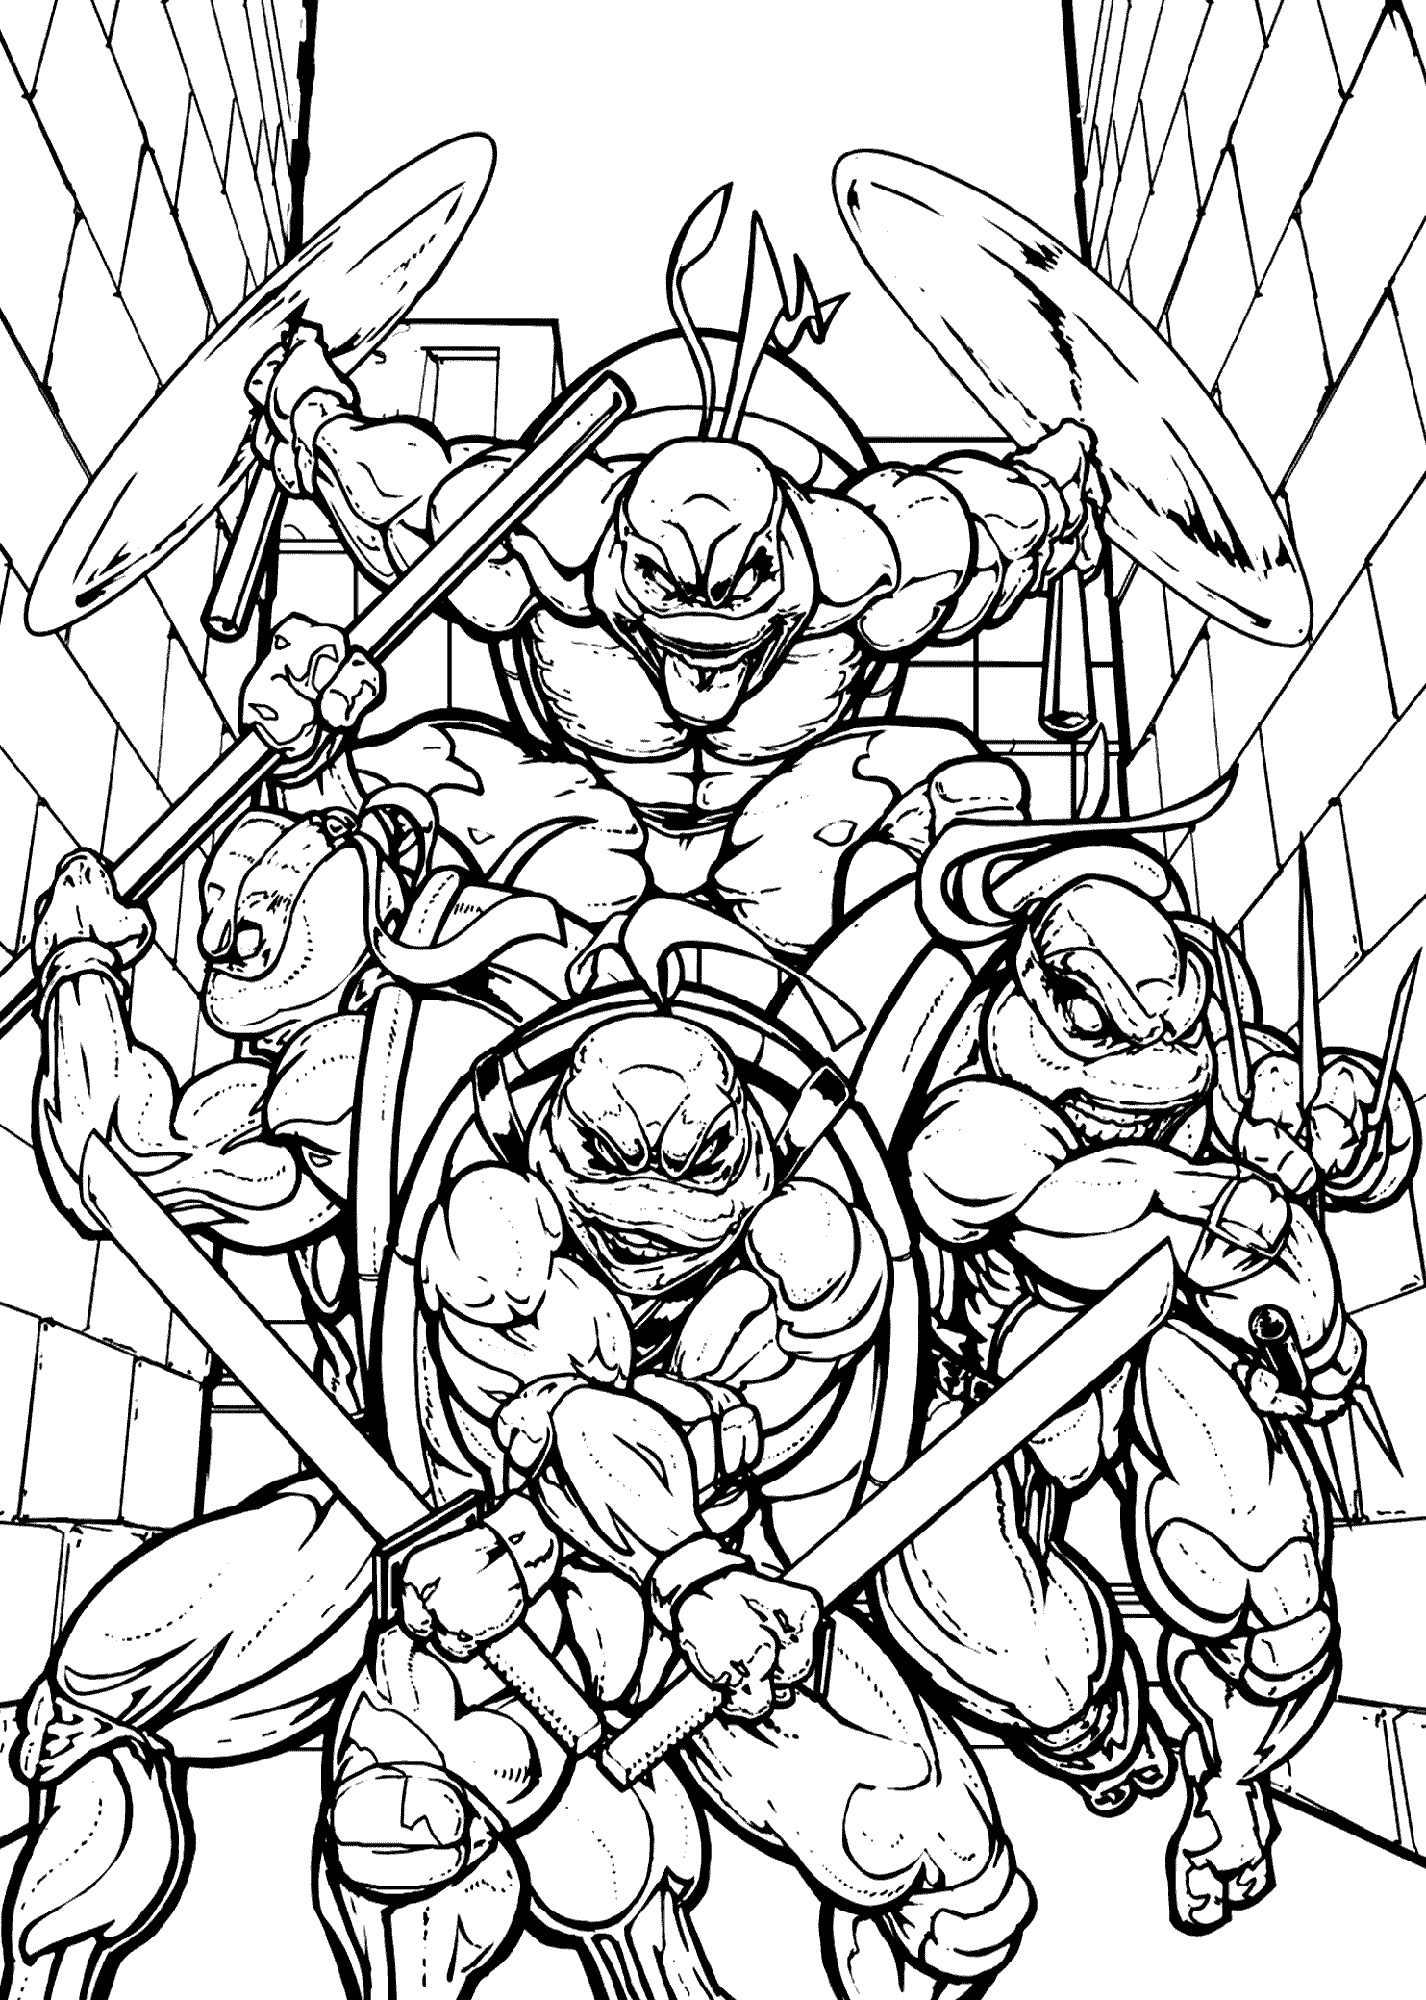 Teenage Mutant Ninja Turtle Coloring Sheets Printable